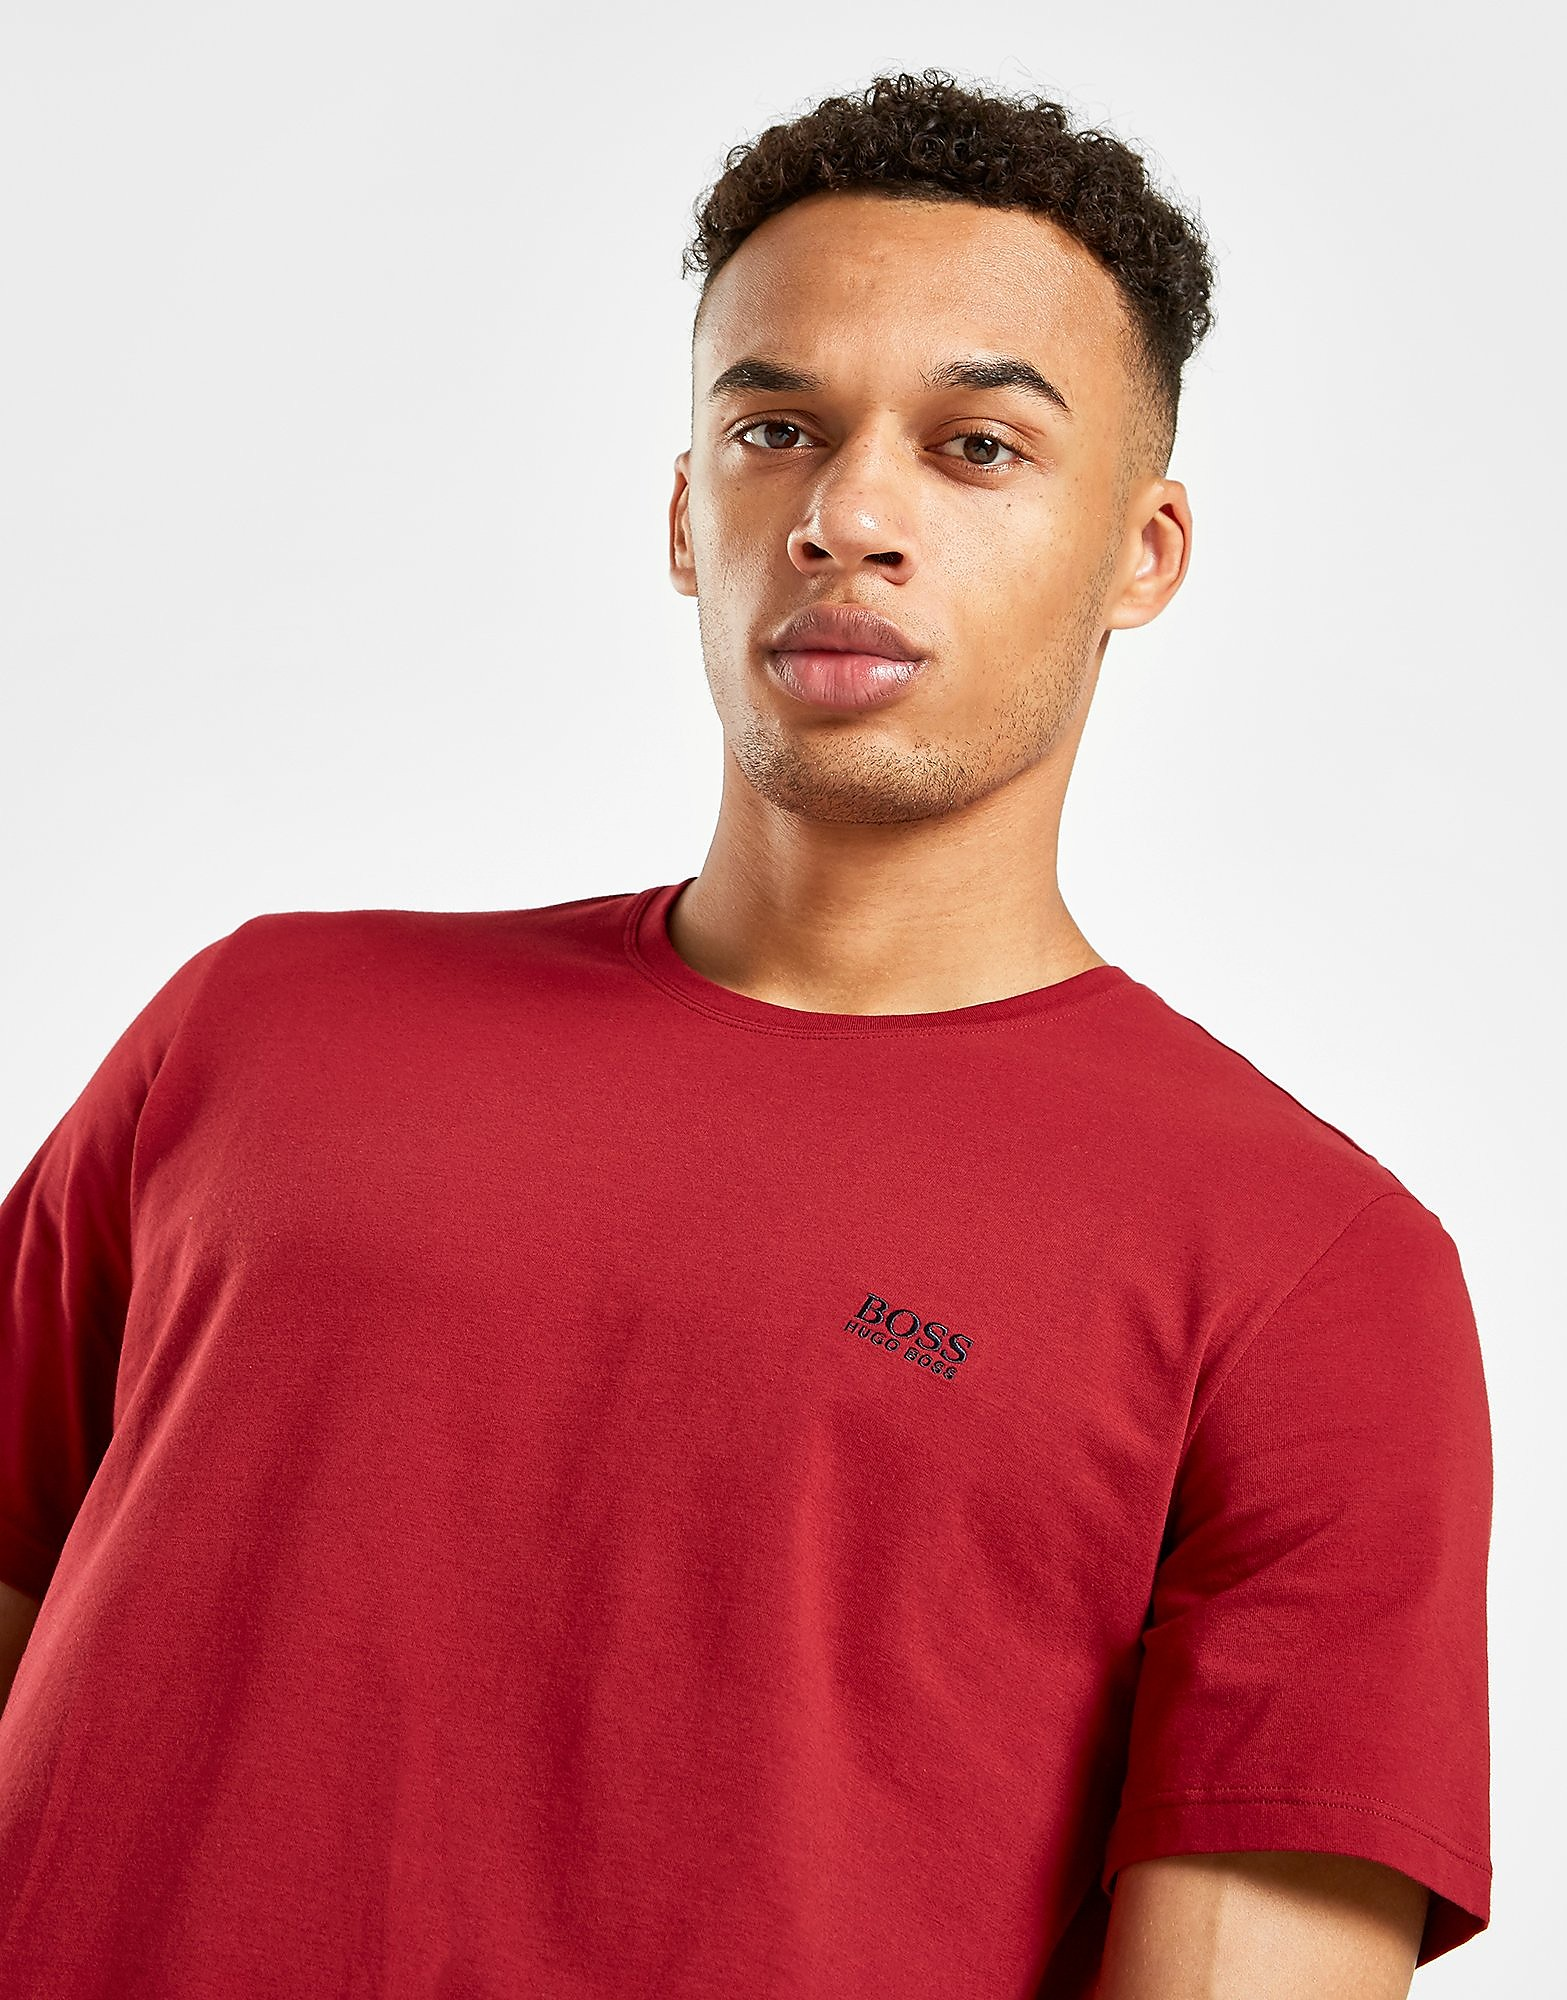 BOSS Green Basic T-Shirt - Burgundy - Heren